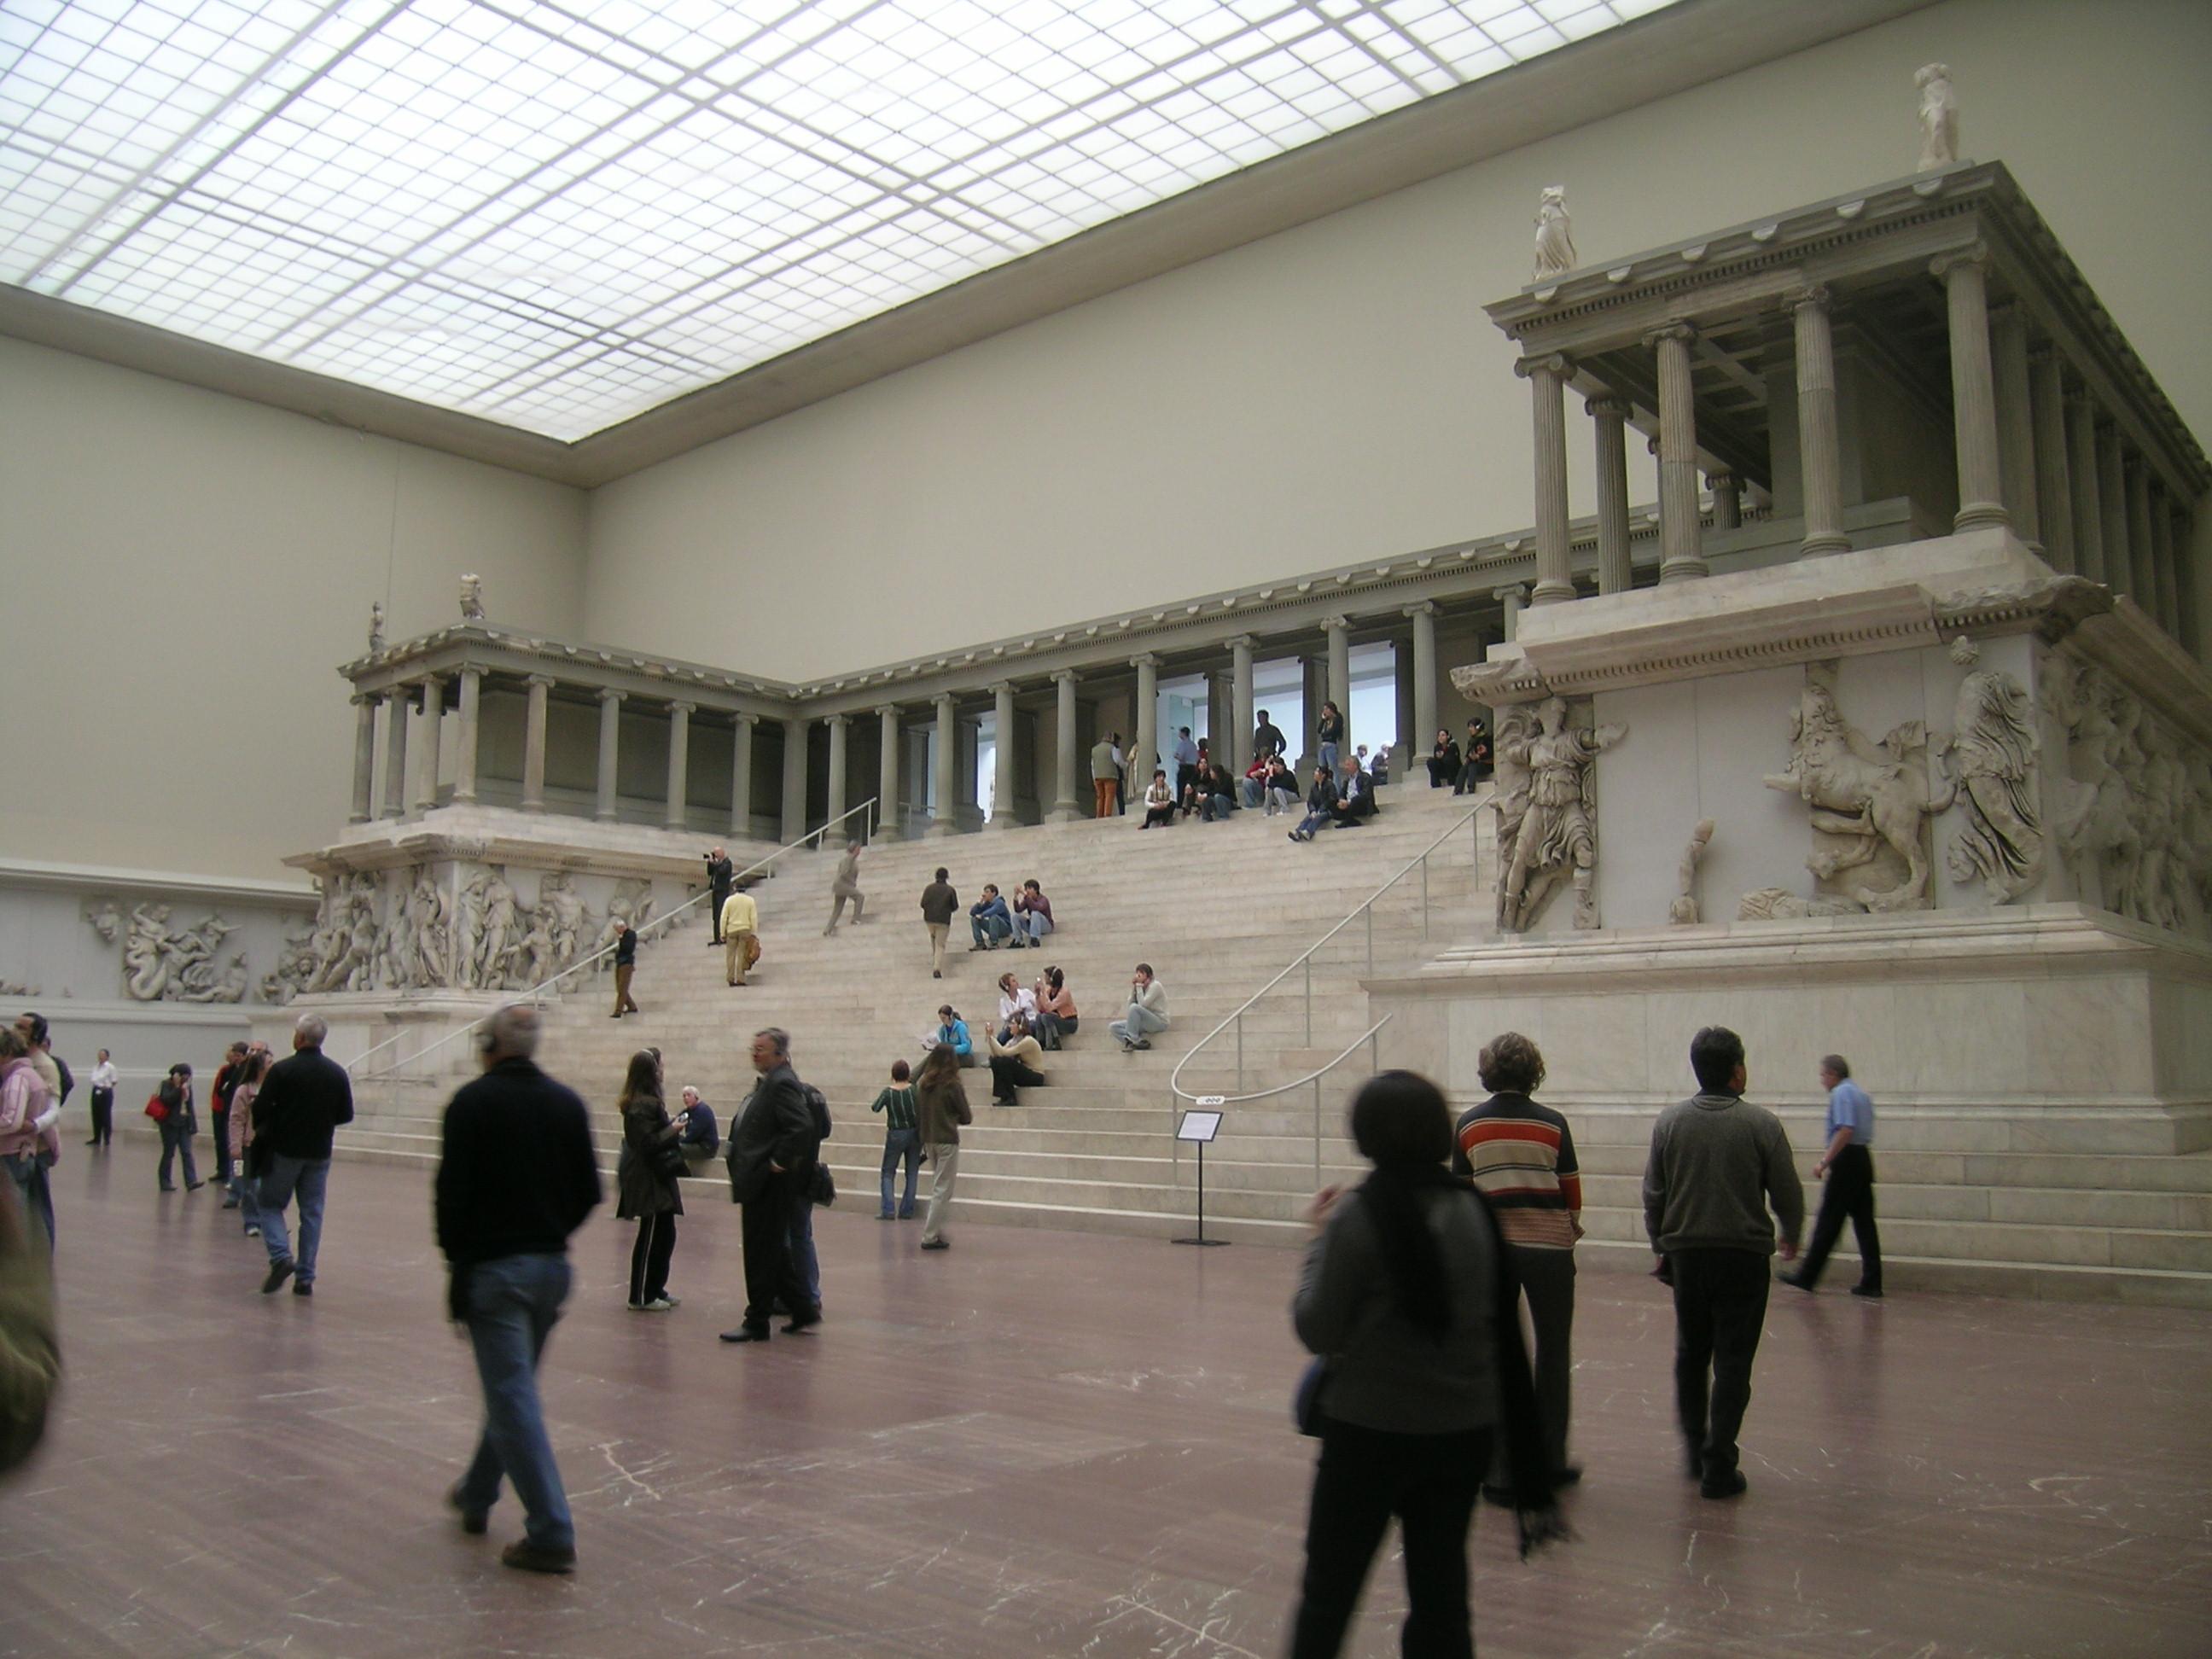 muzea w berlinie Muzeum Pergamońskie (Pergamonmuseum)